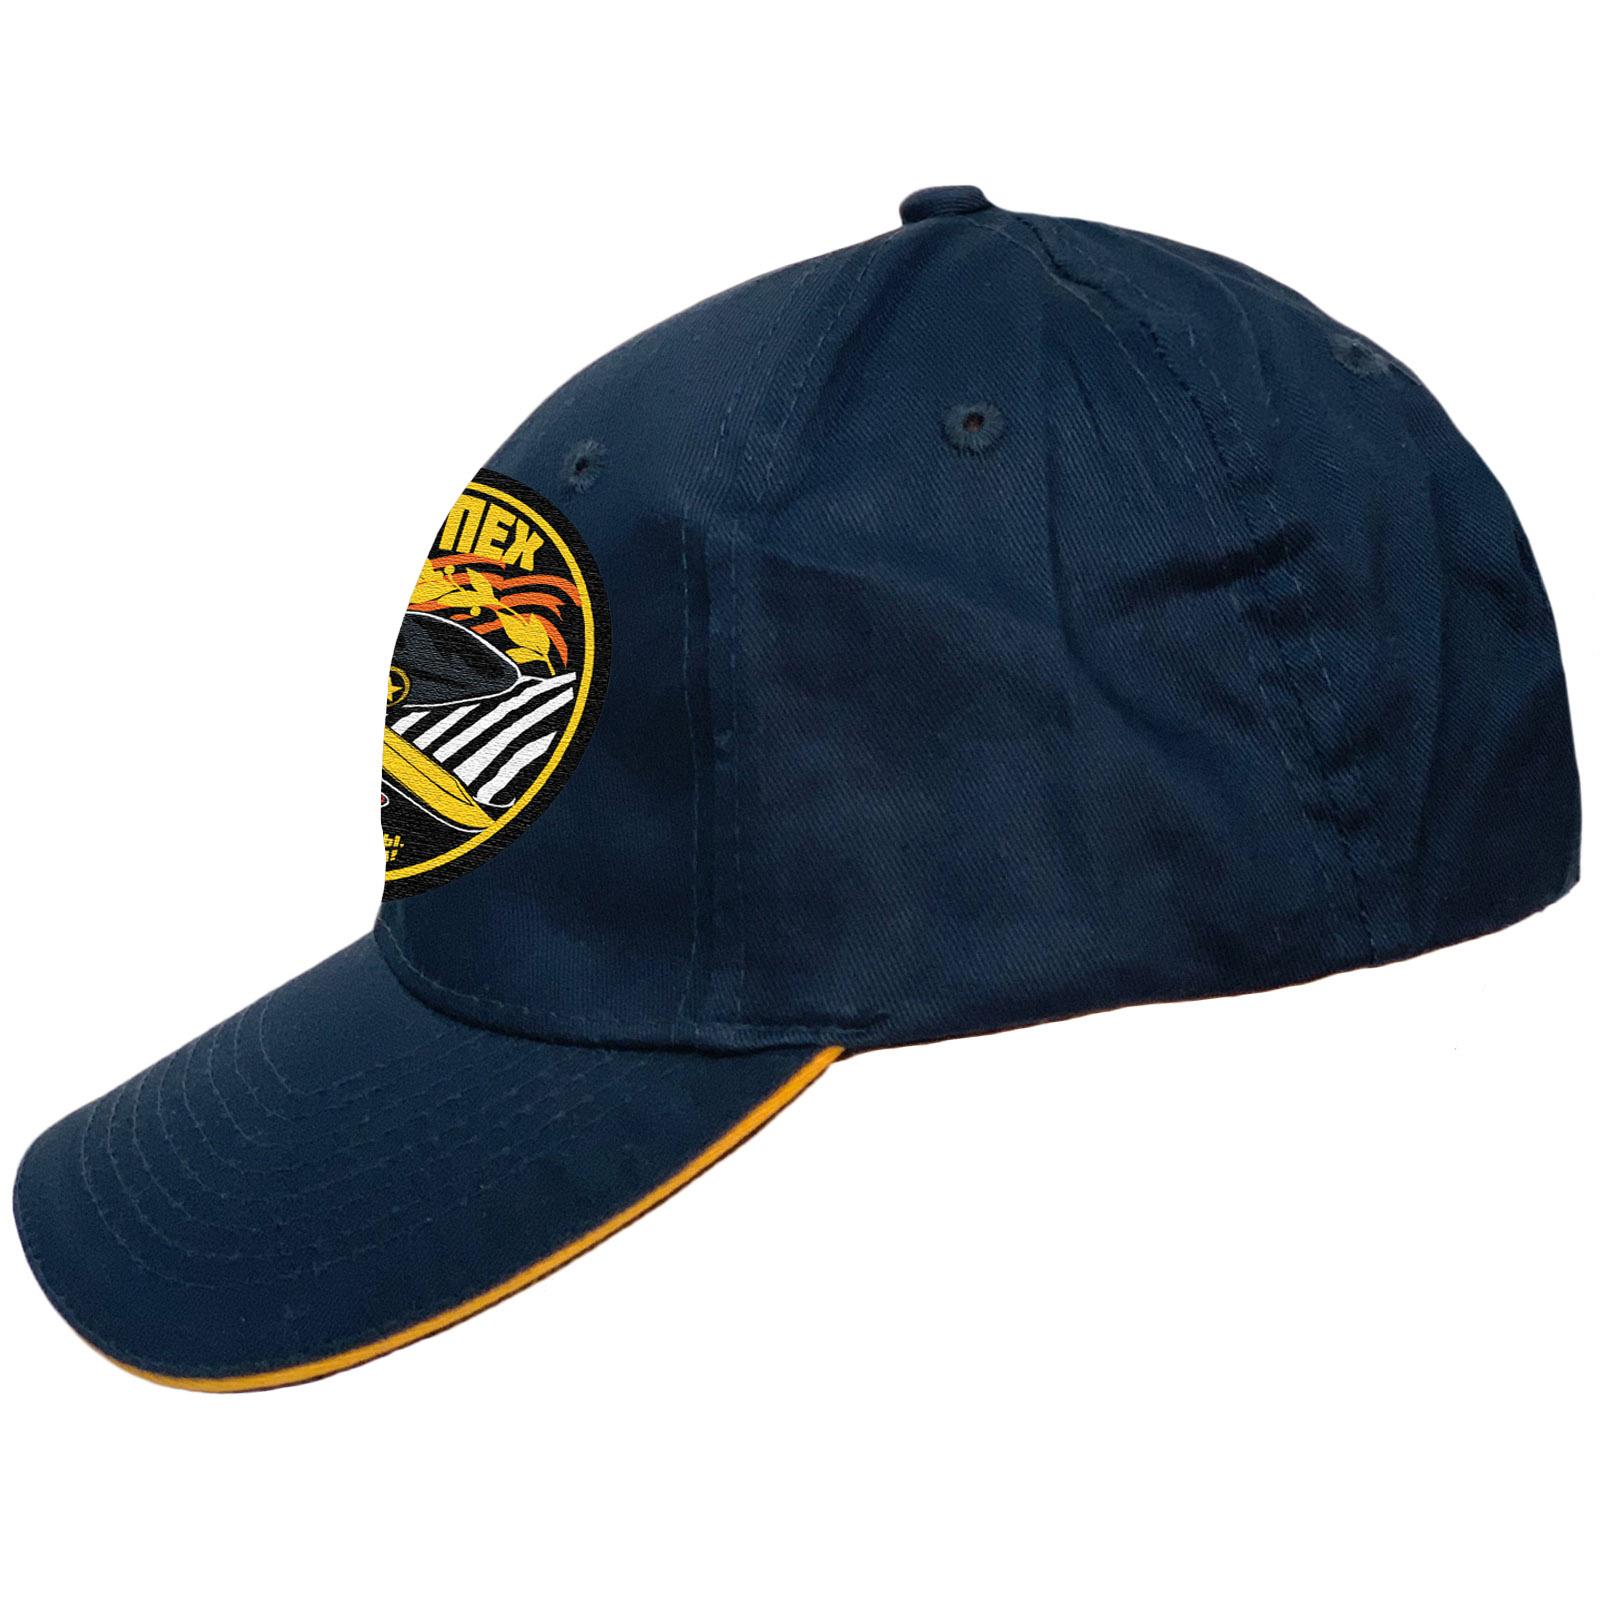 Мужская синяя кепка Морпех